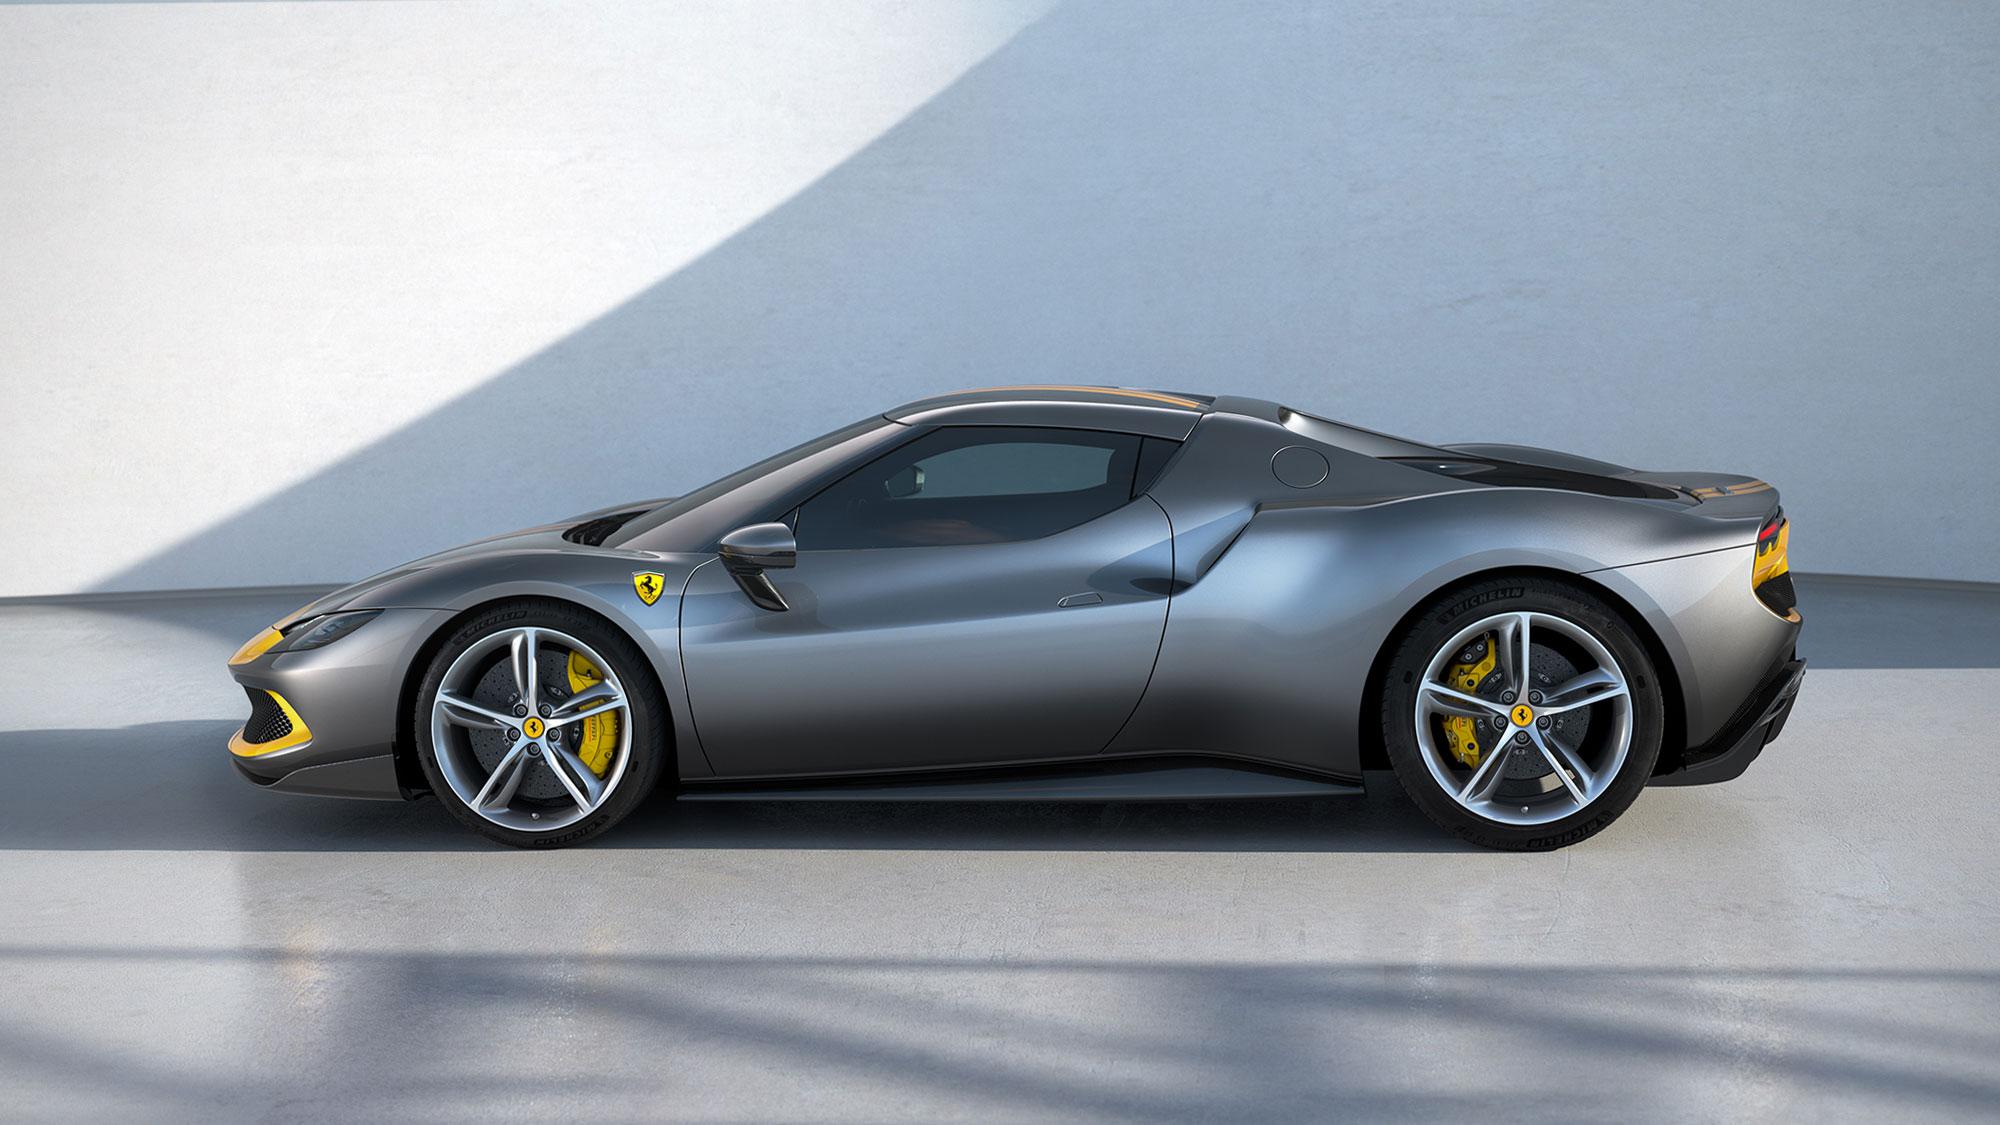 2022 Ferrari 296 GTB Hybrid Supercar